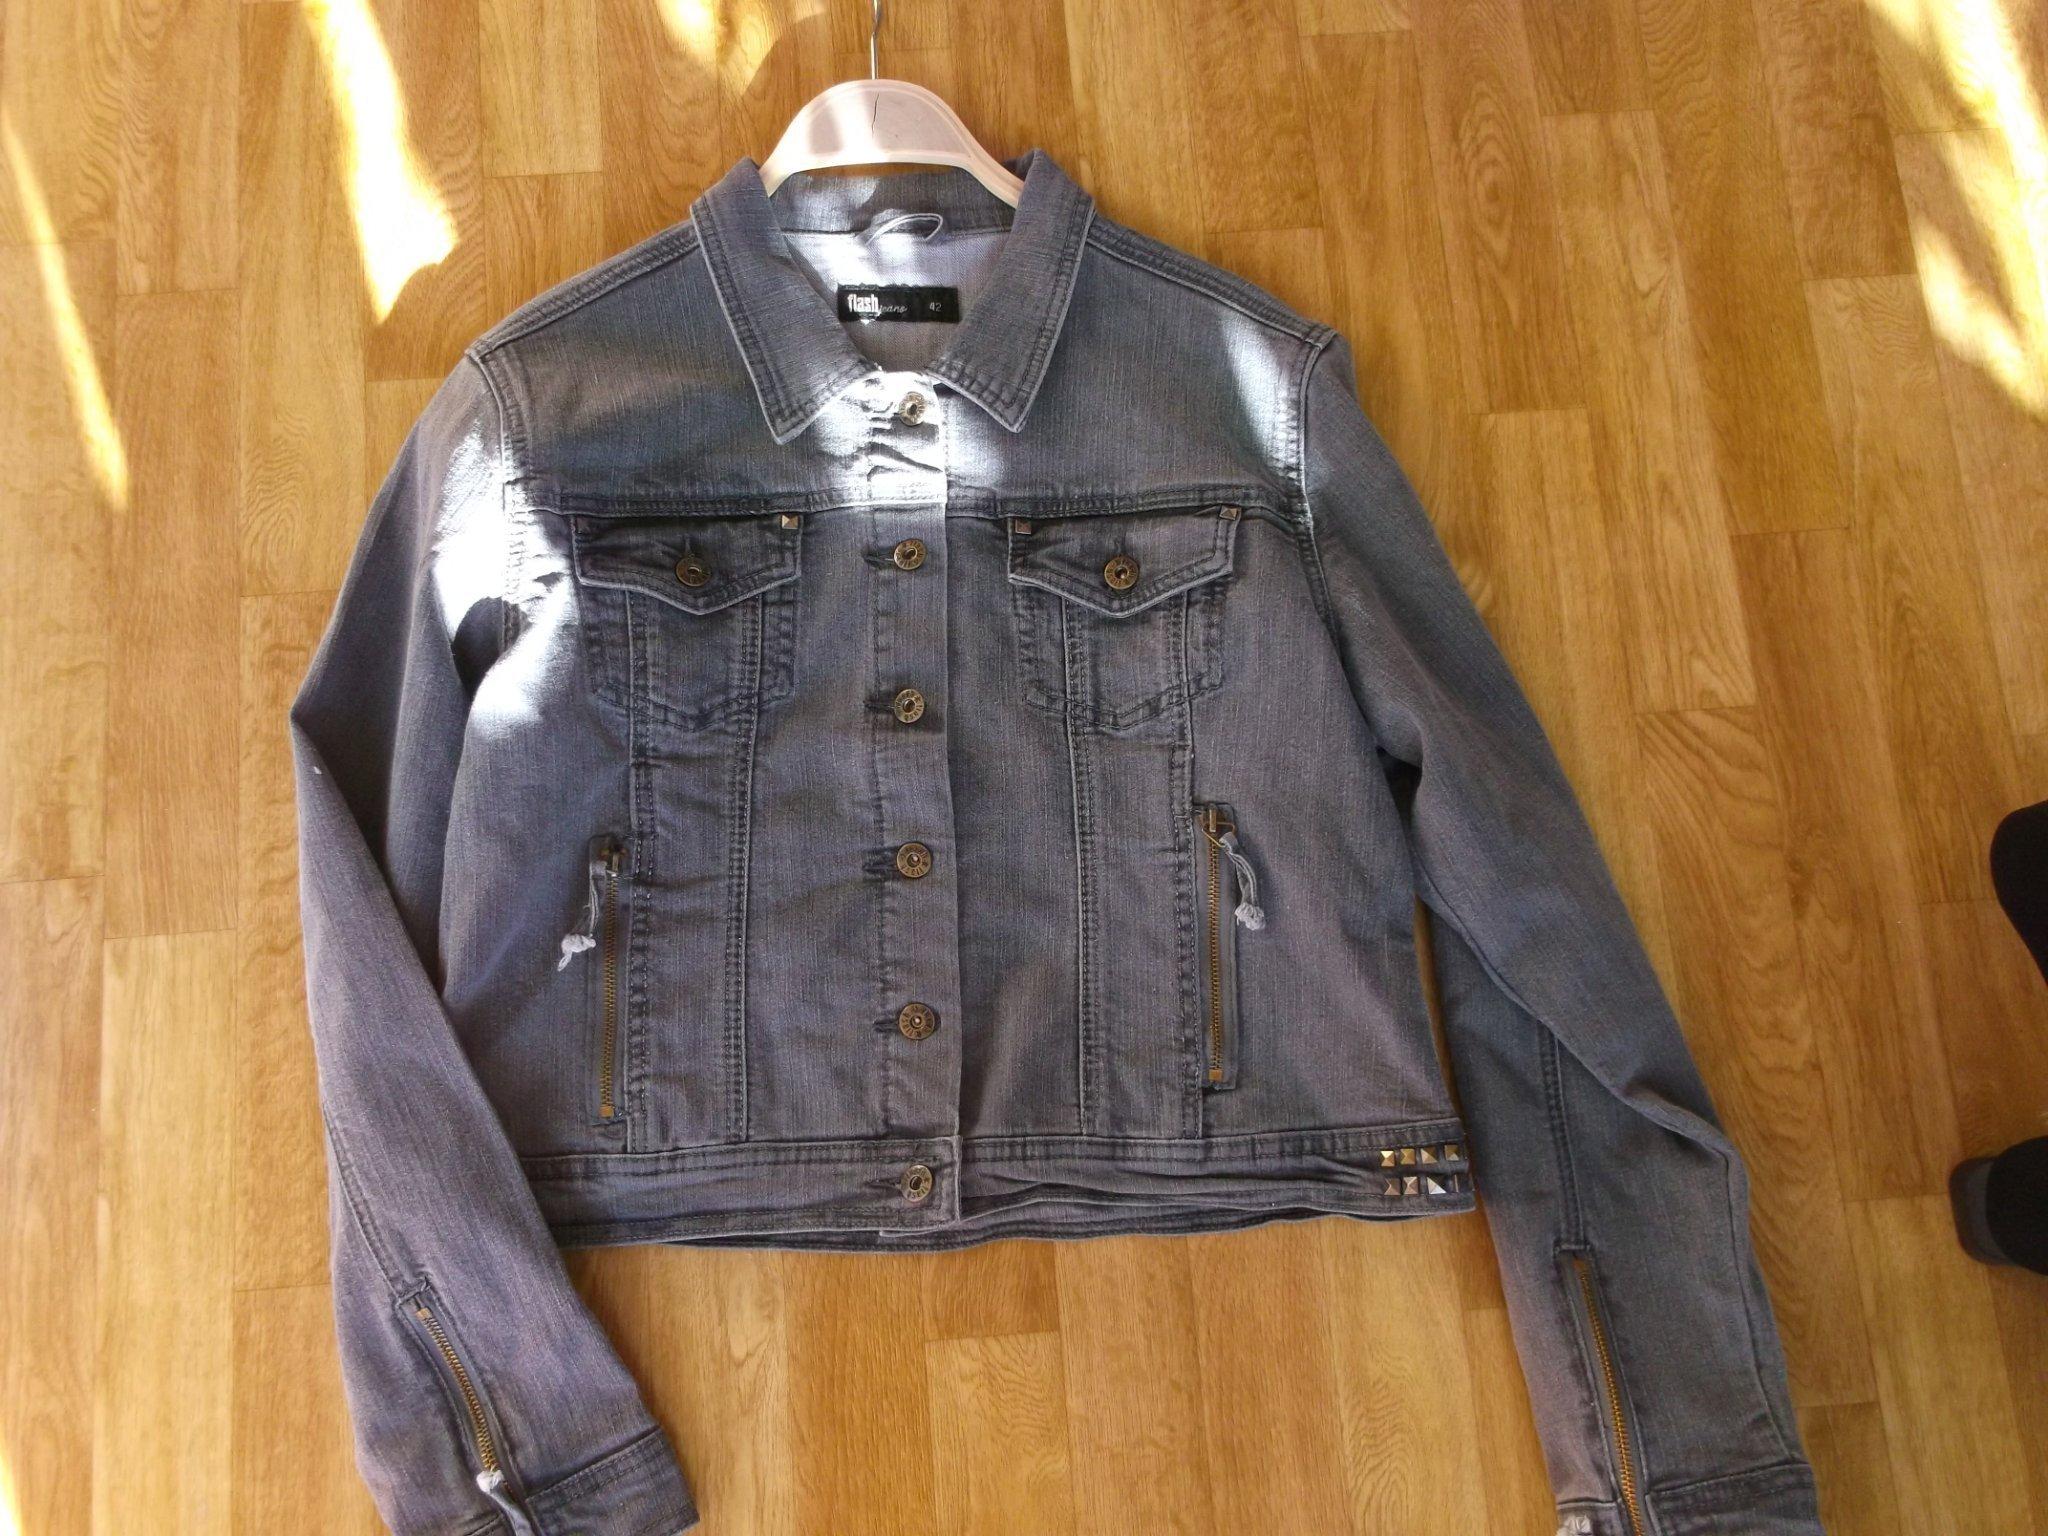 Cool jacka jeansjacka grå nitar 42 flash dragke.. (425195208